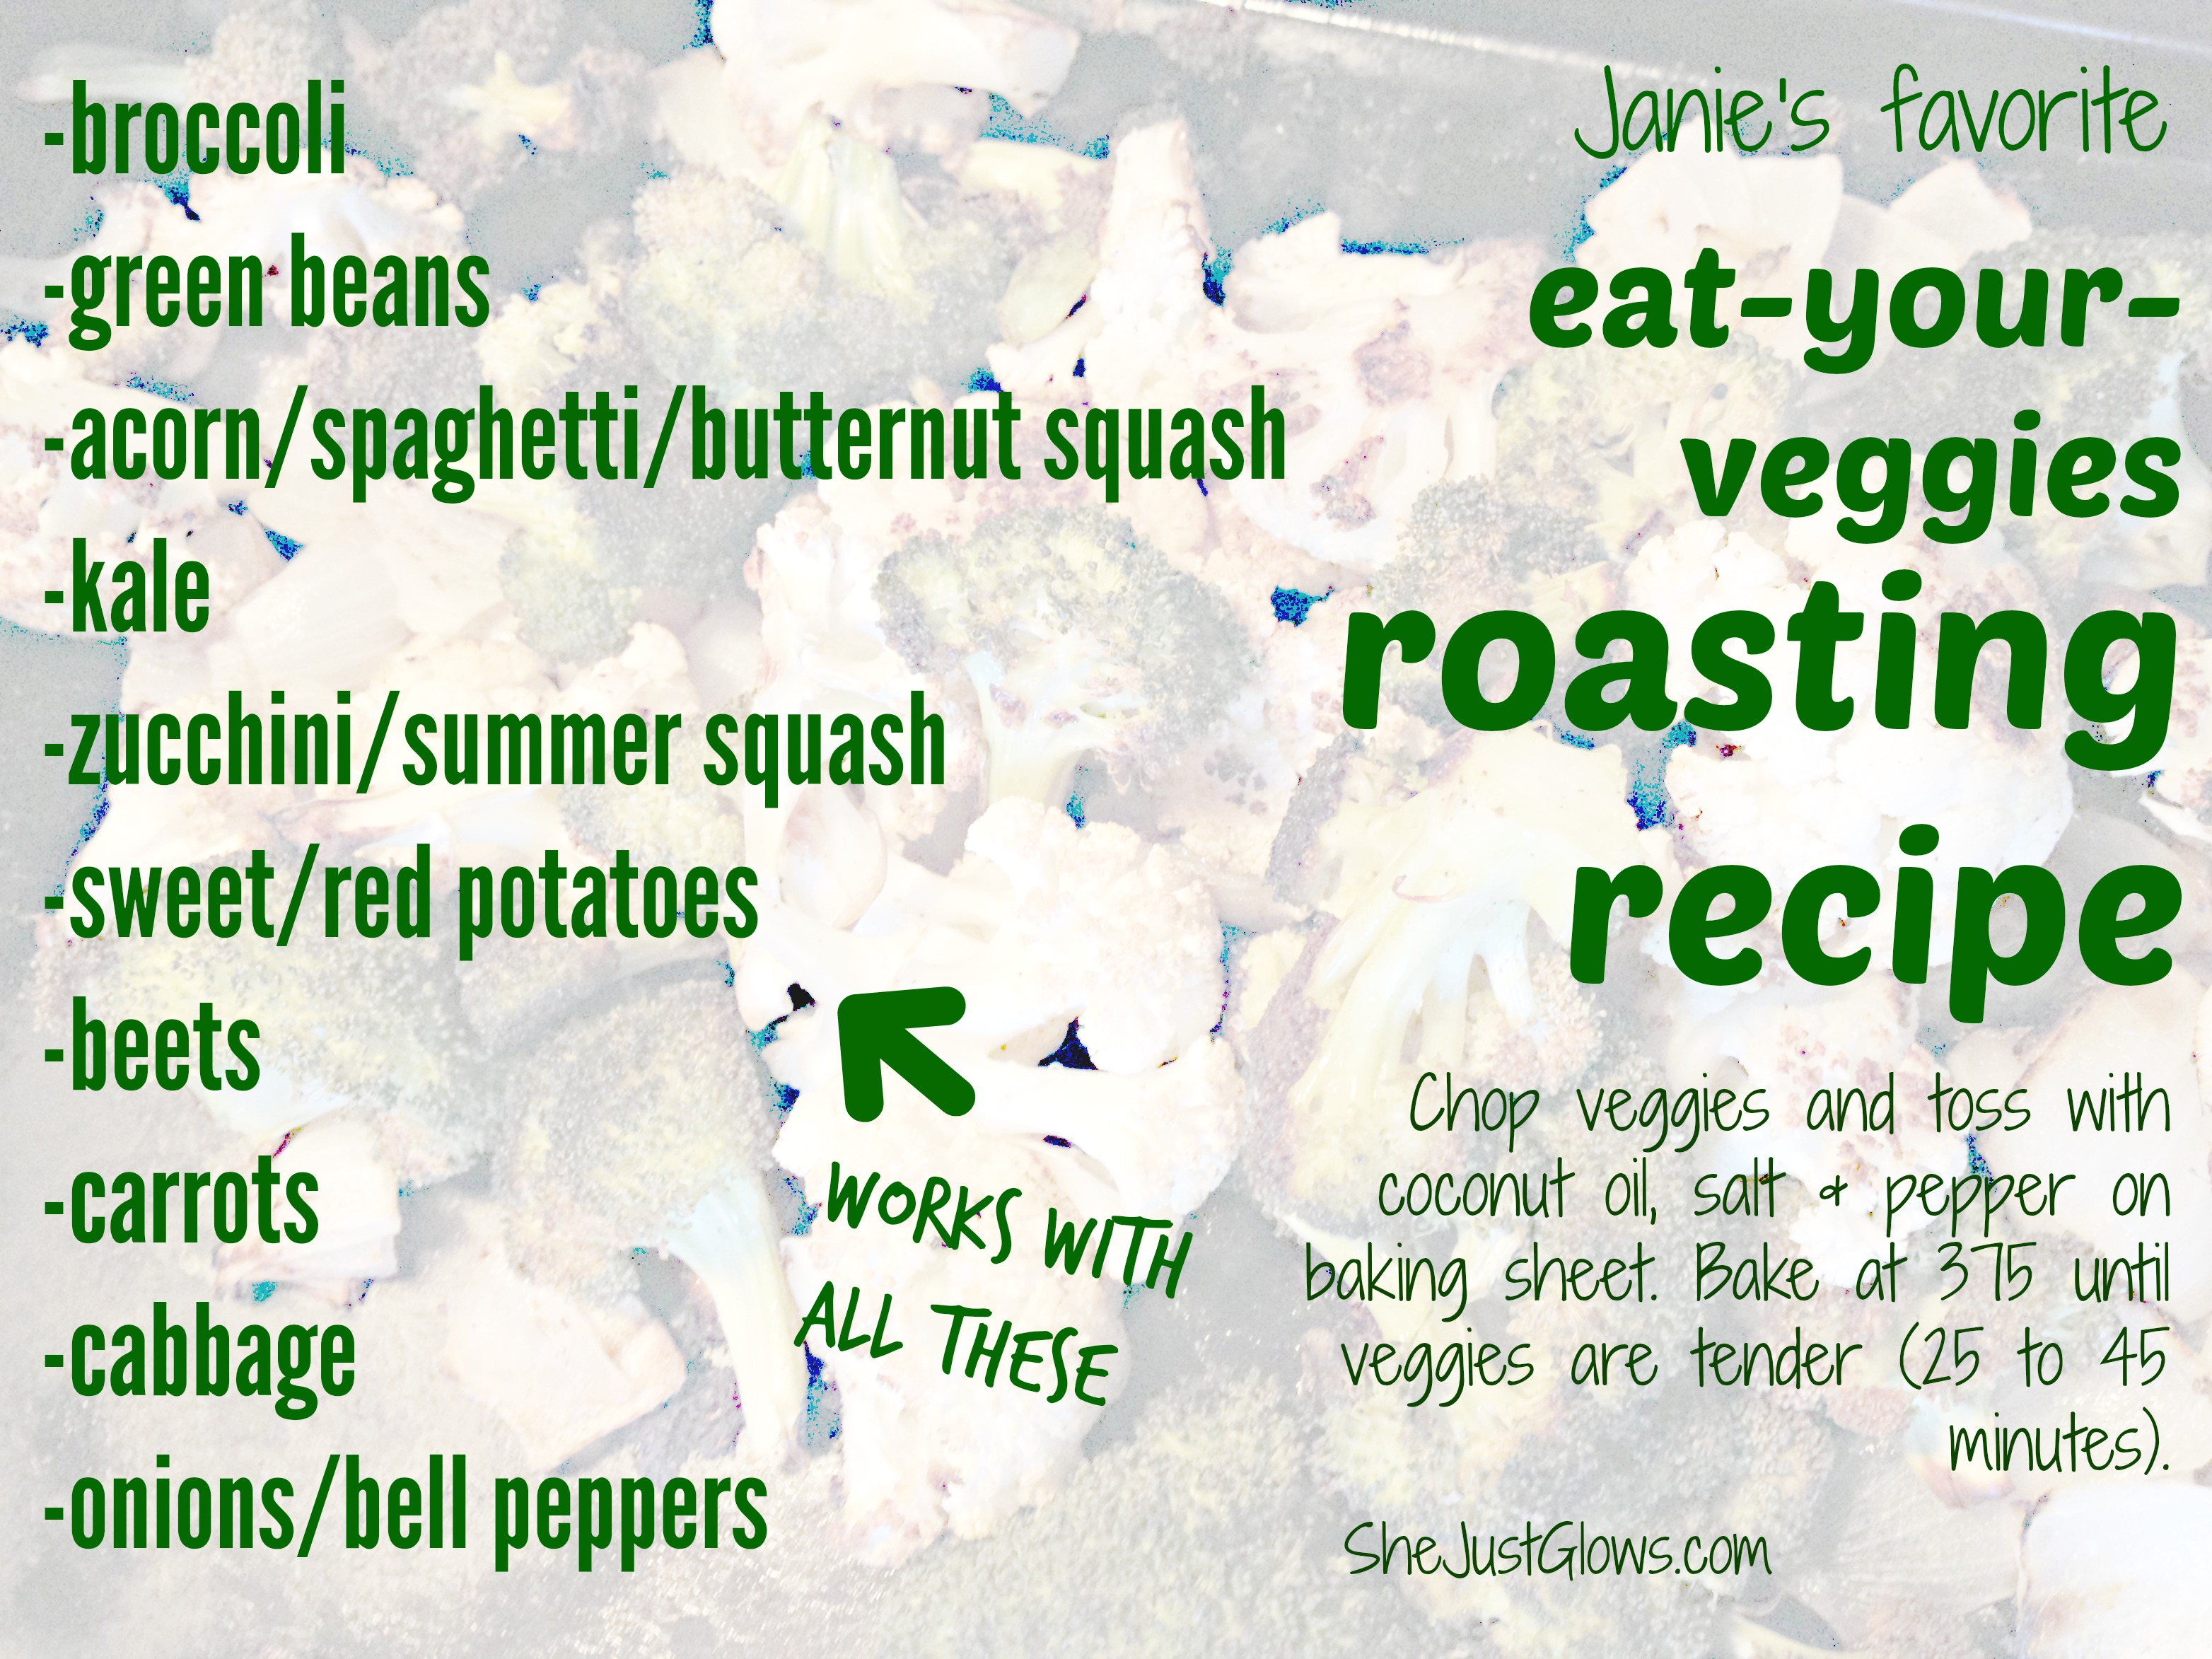 Janie's Favorite Eat-Your-Veggies Roasting Recipe SheJustGlows.com